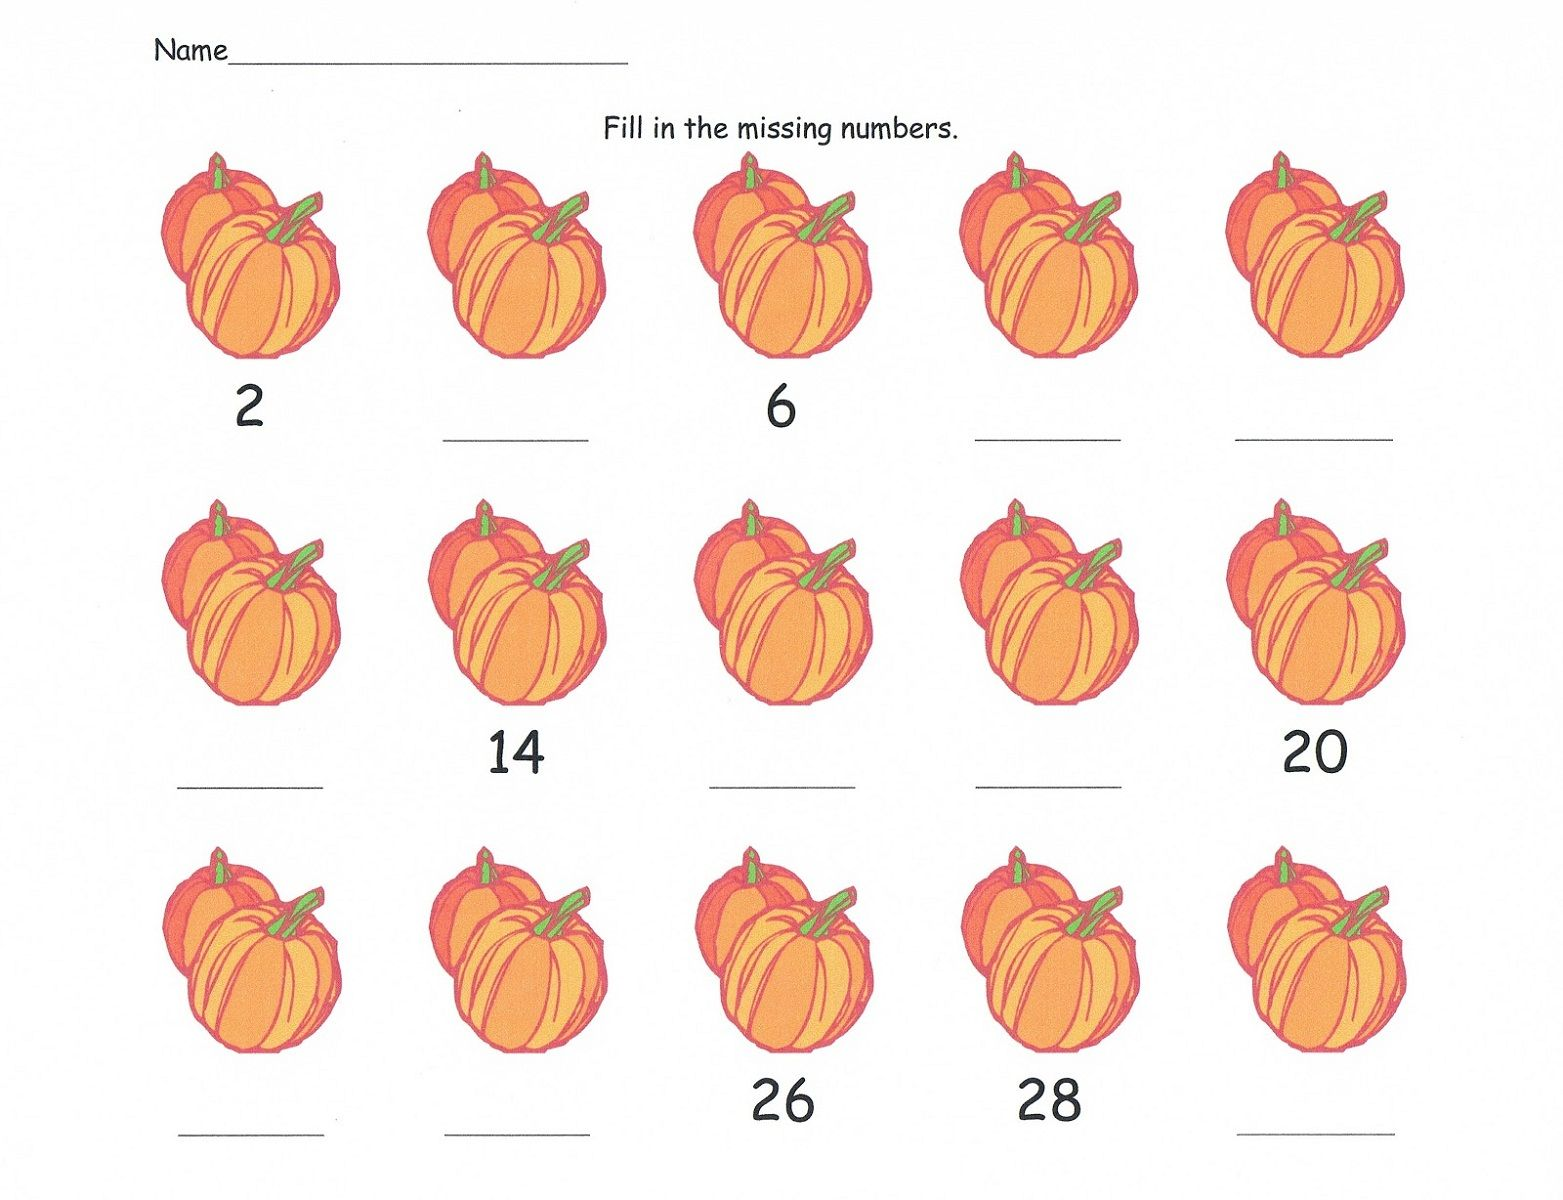 Skip Count Worksheets For Enjoyable Math Learning